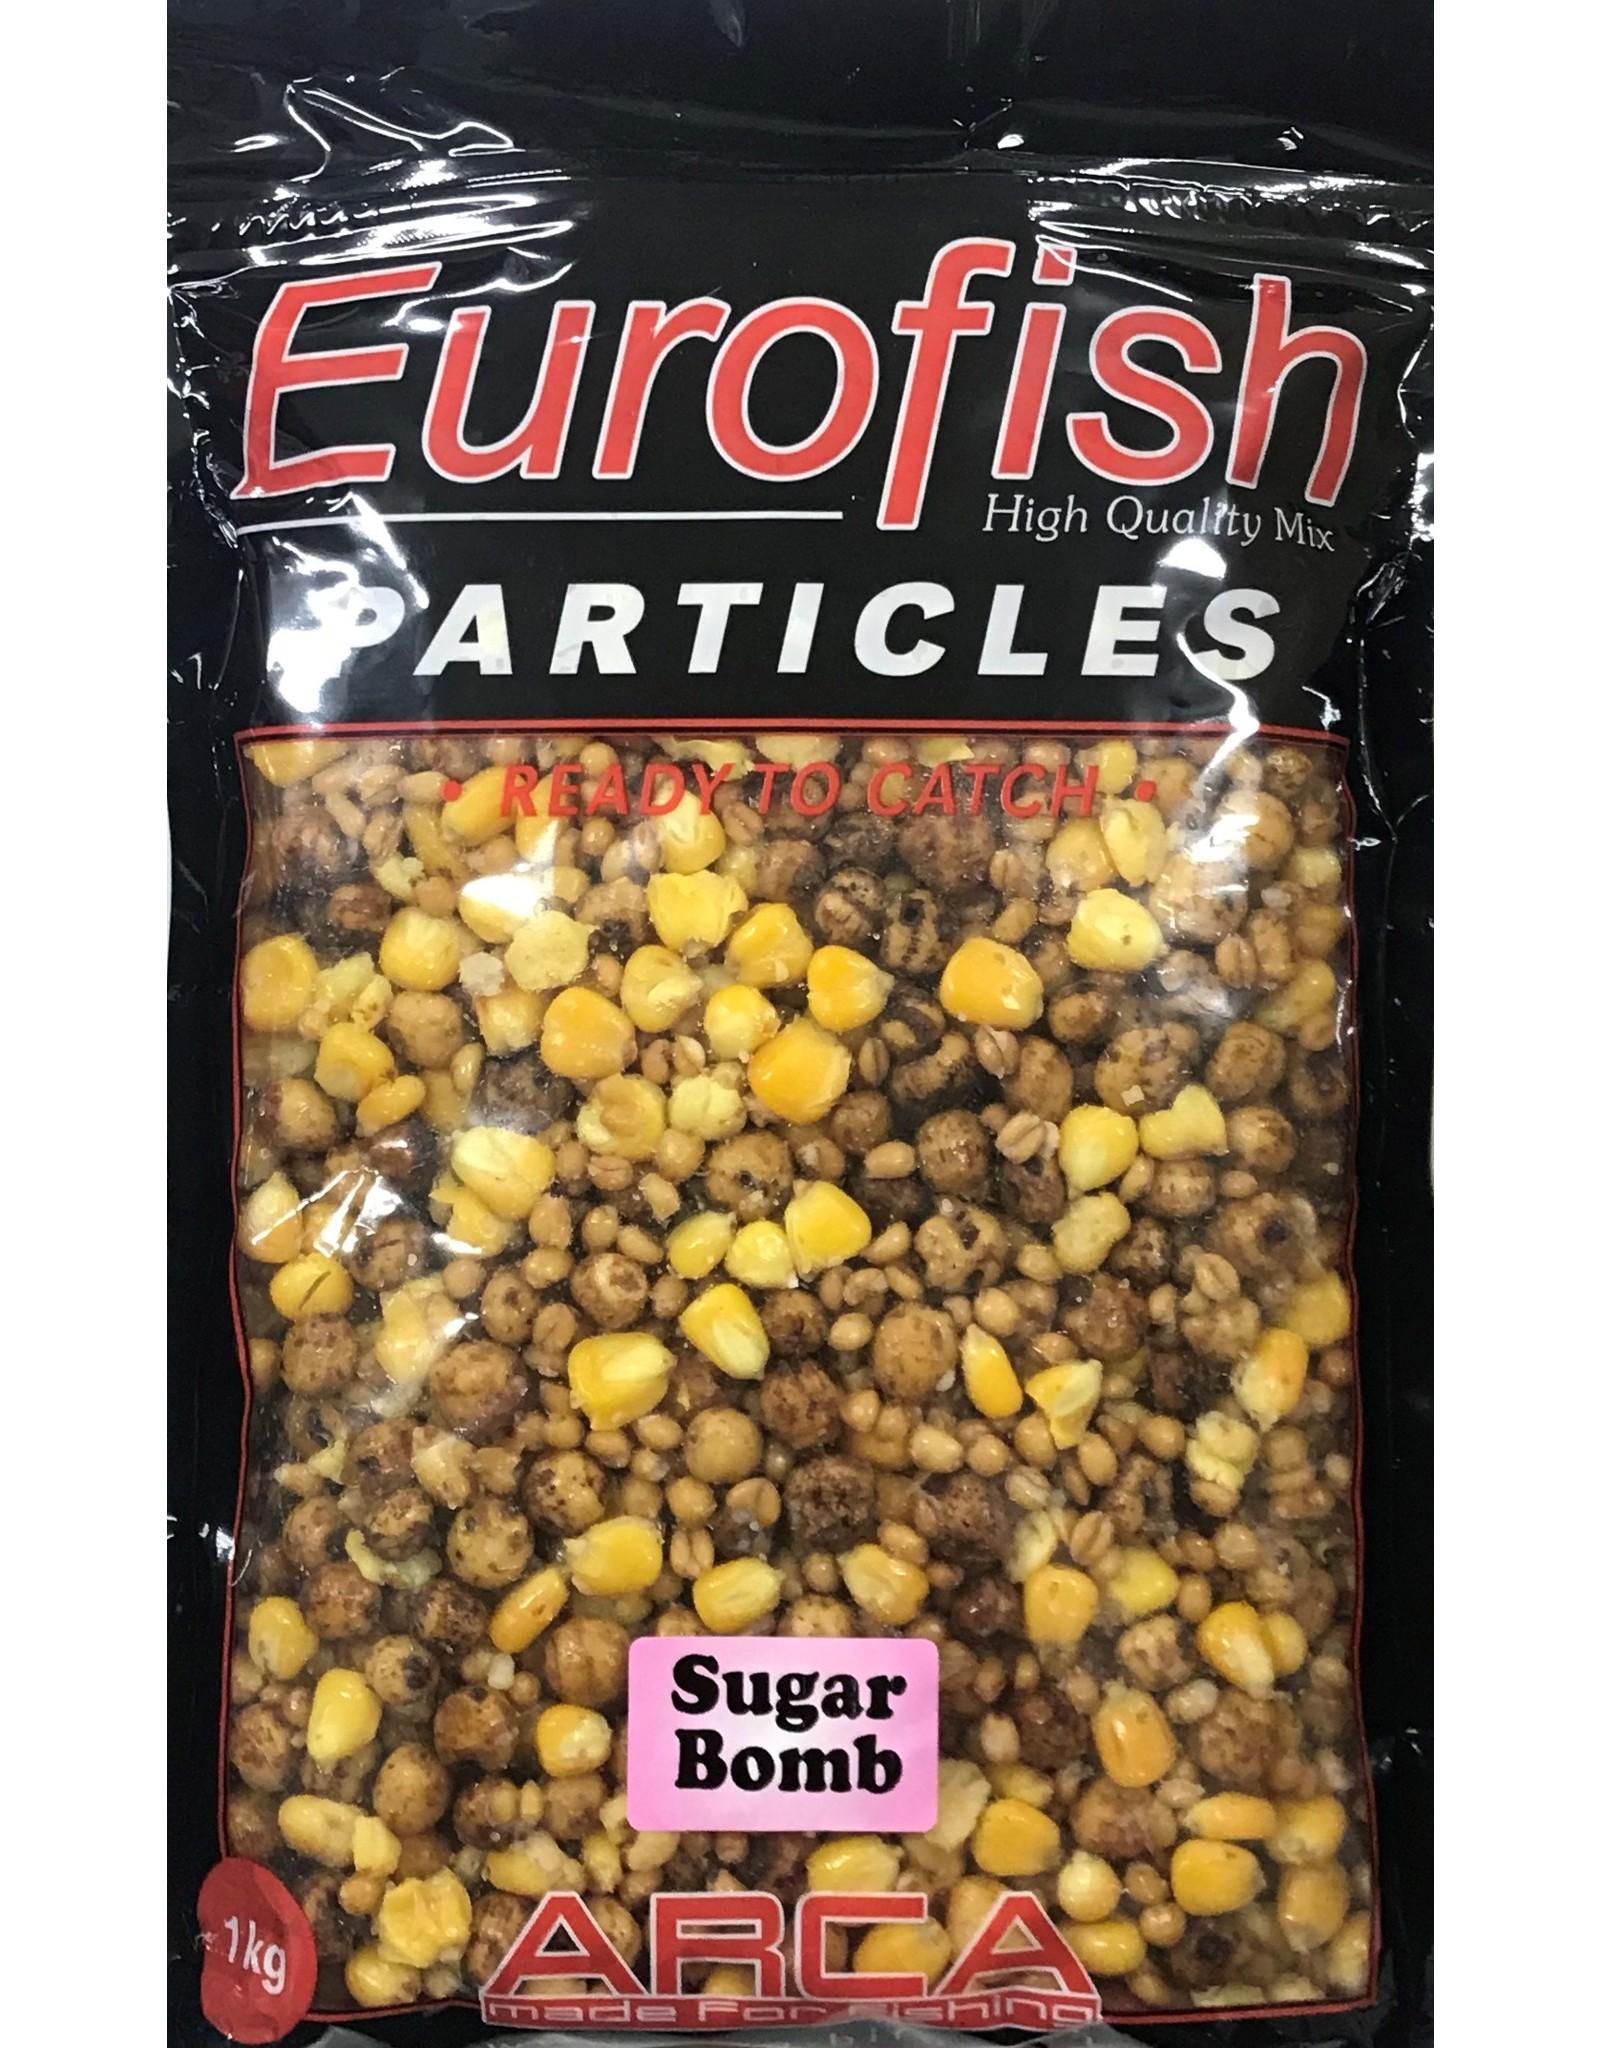 EUROFISH sugar bomb 1kg